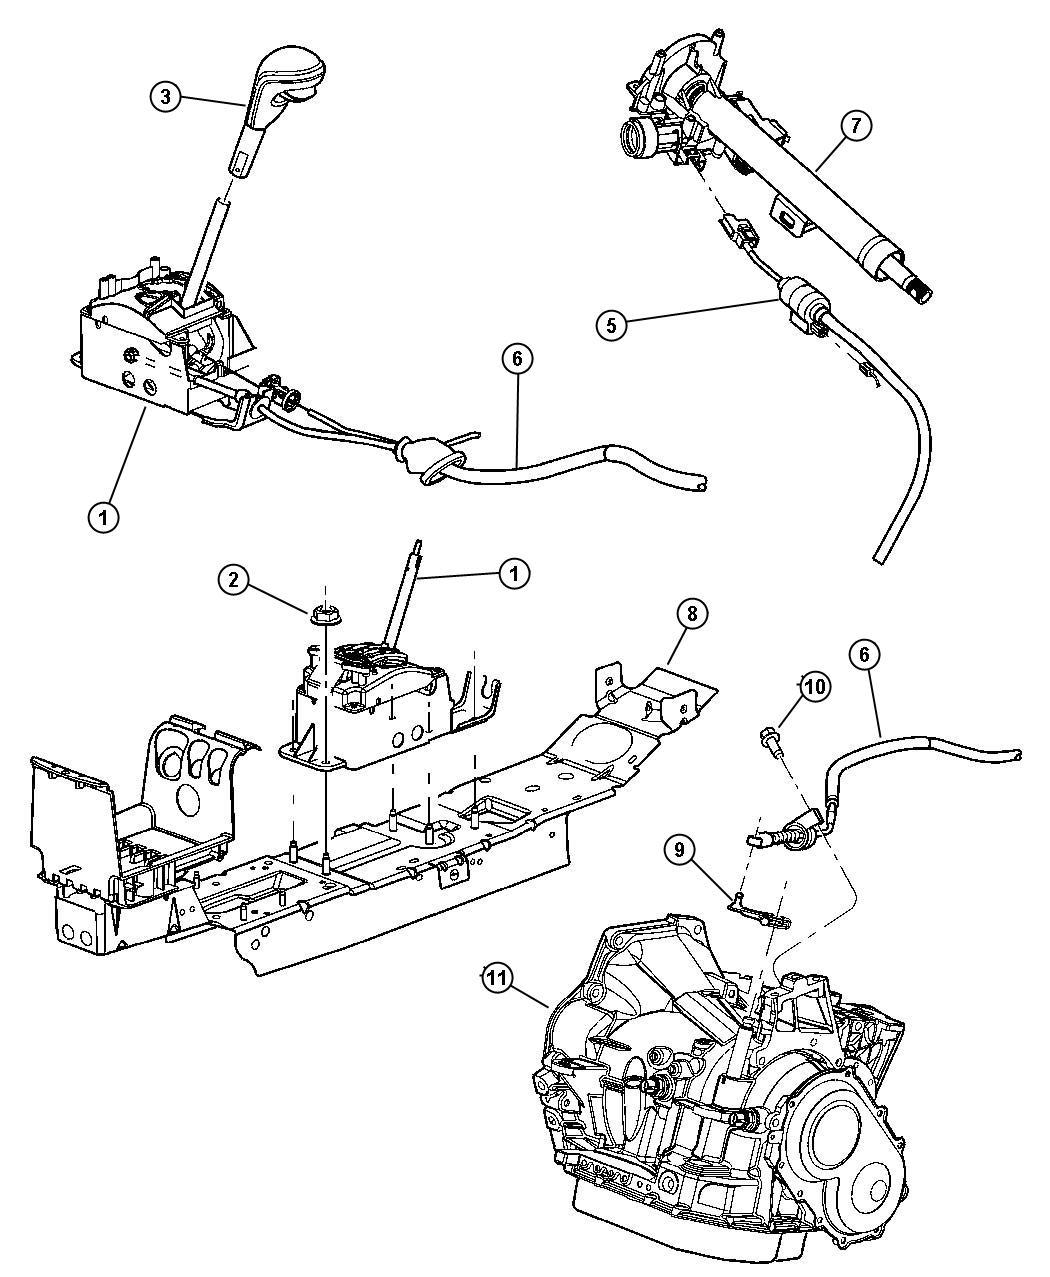 Dodge Stratus Gear Shift Controls